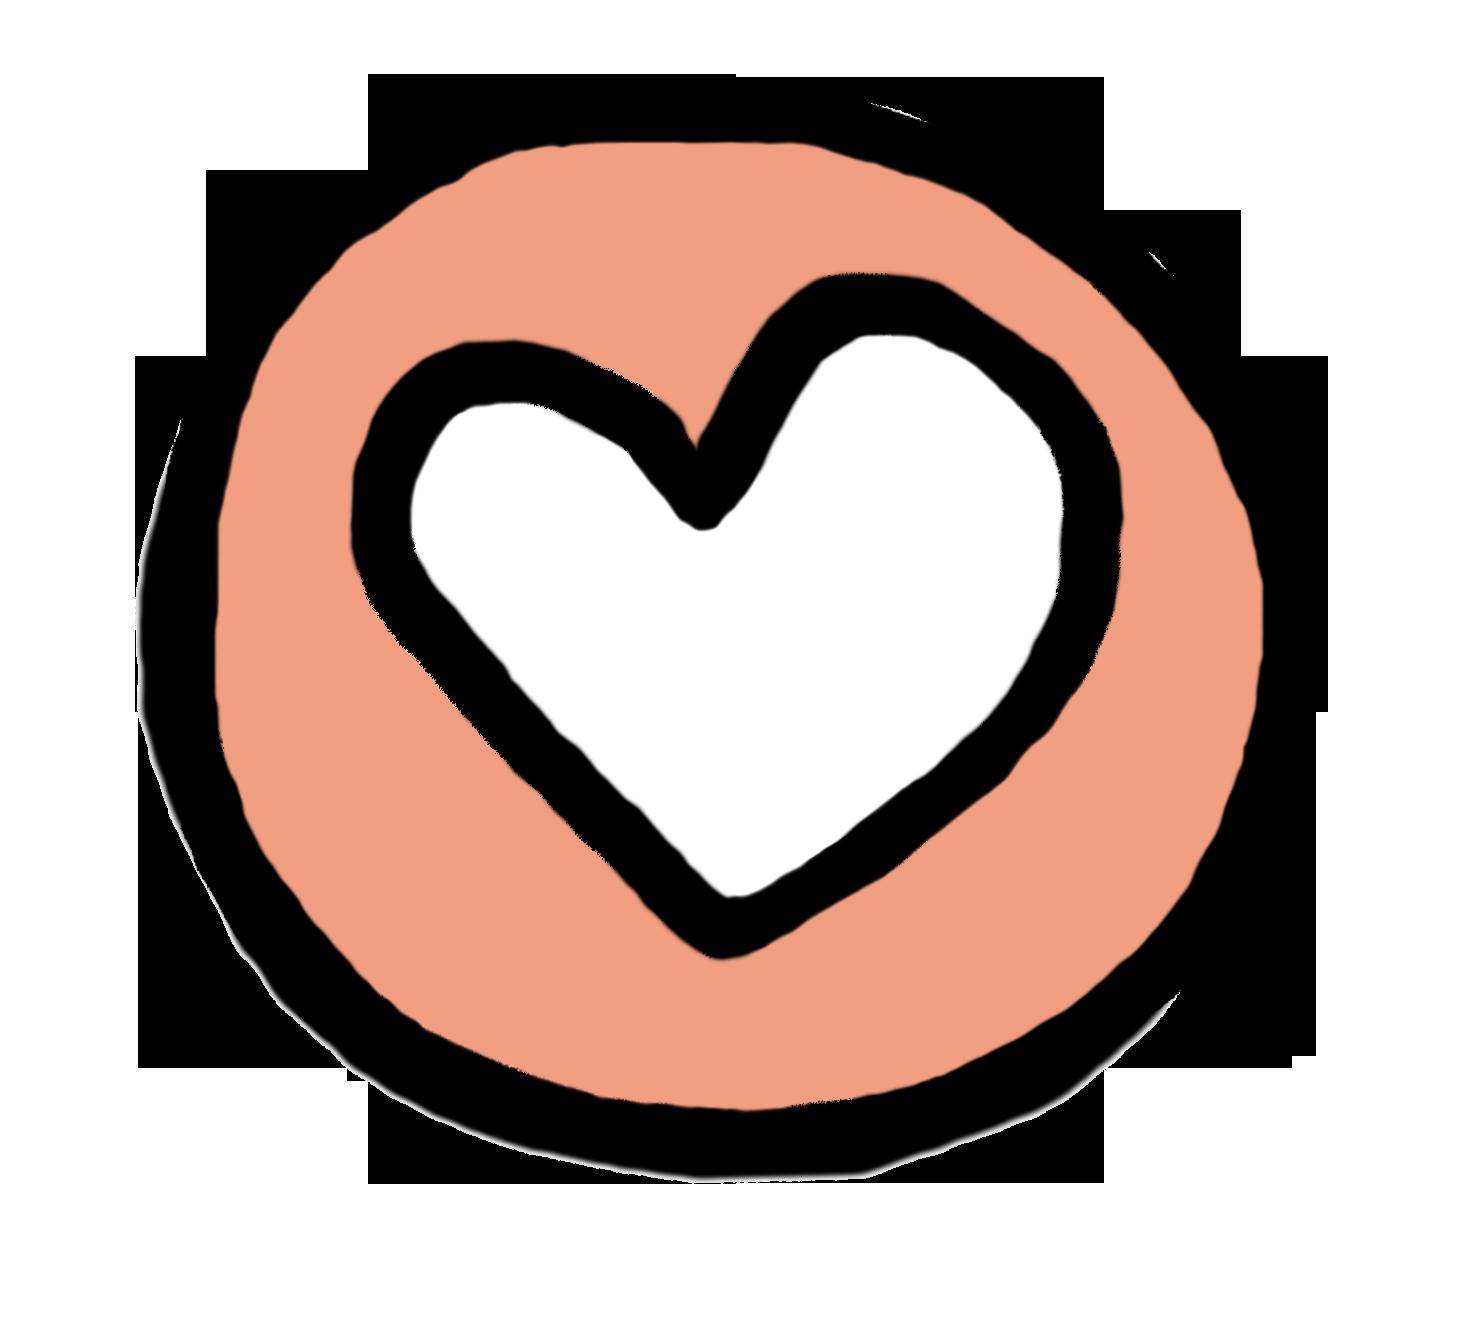 hart pictogram roze